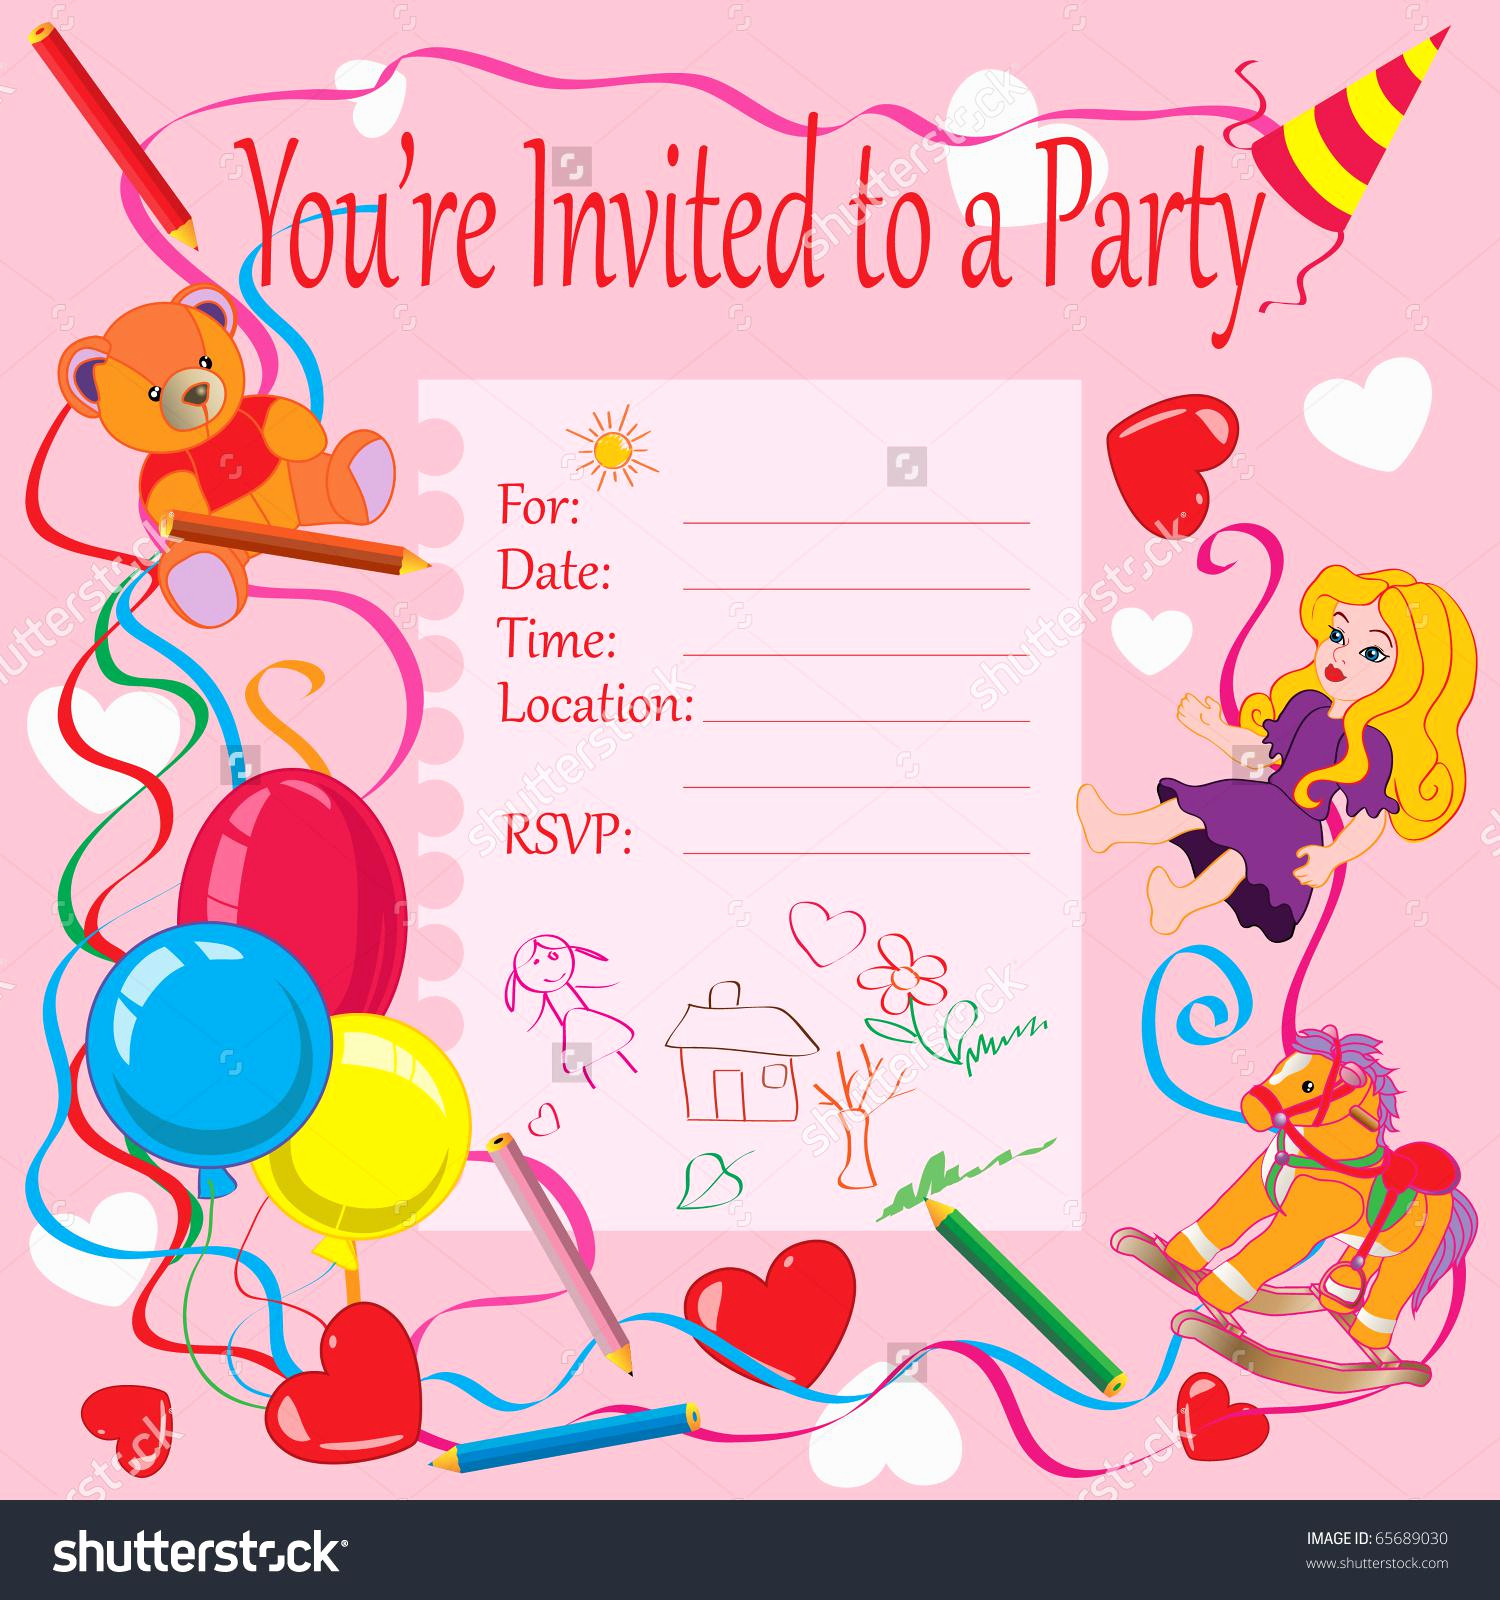 Birthday Invitation Card Ideas Elegant 20 Birthday Invitations Cards – Sample Wording Printable